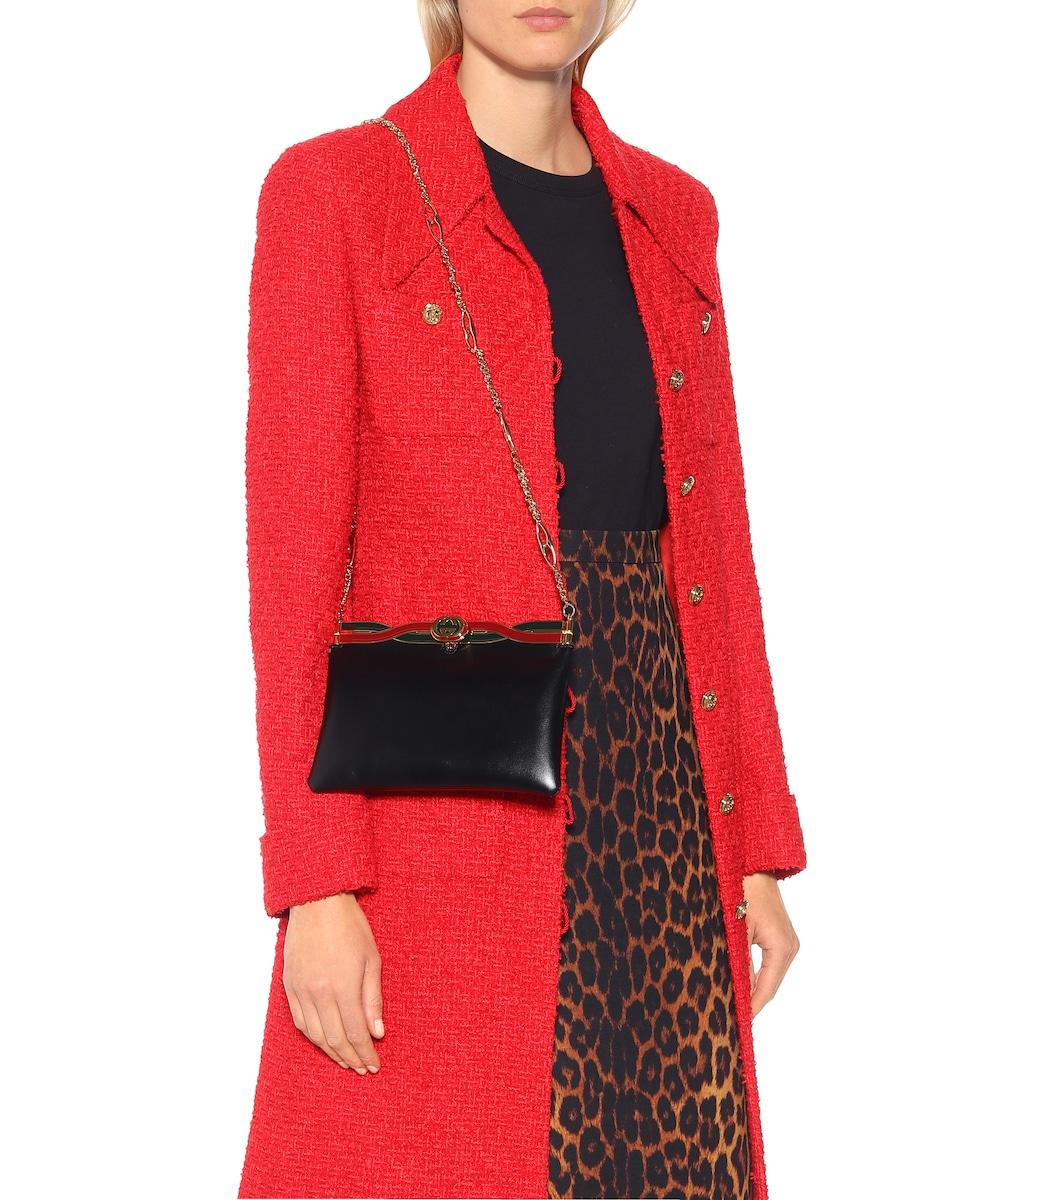 01b260435f1 Broadway Leather Shoulder Bag - Gucci